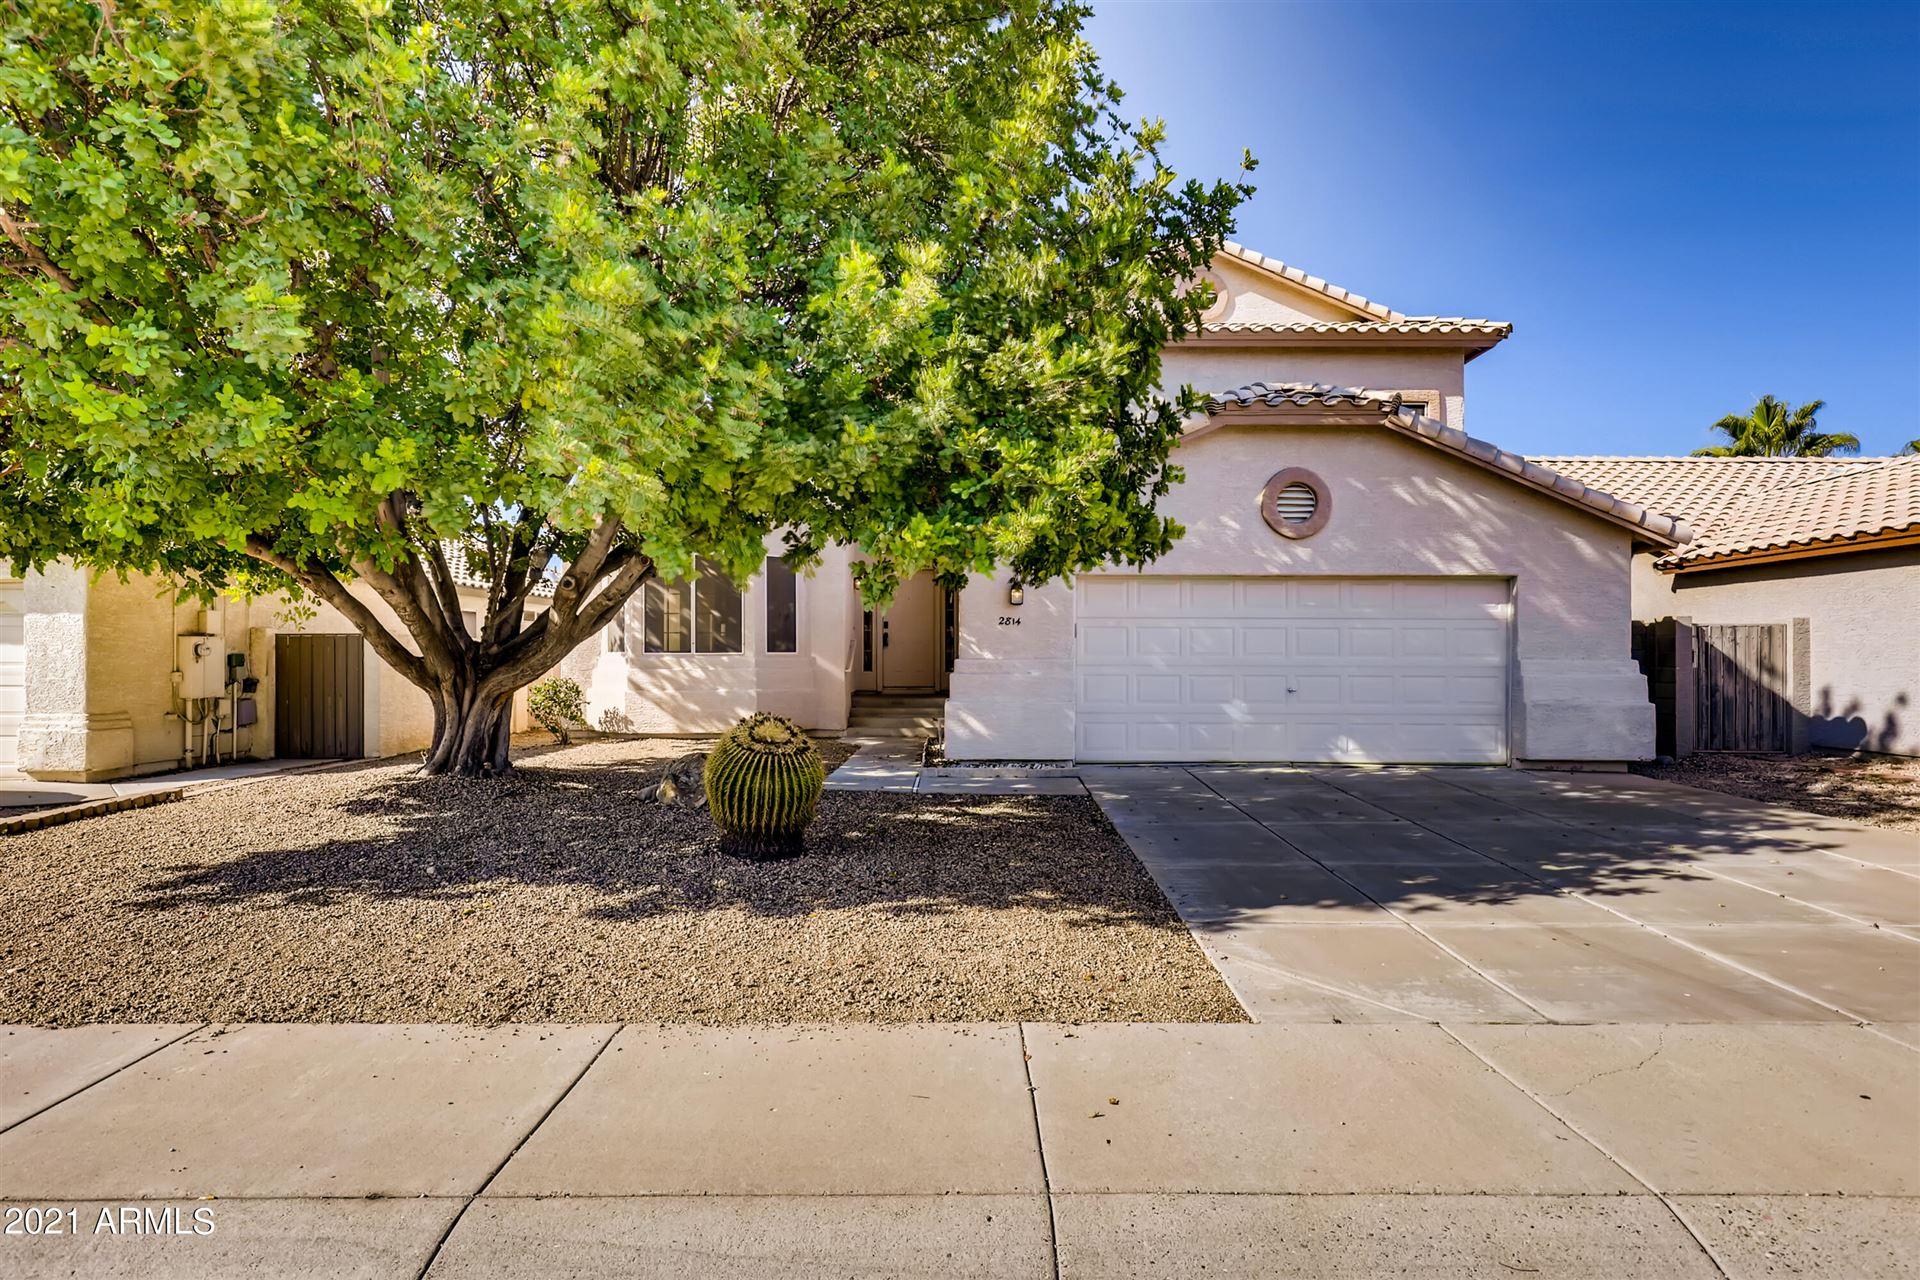 2814 E PONTIAC Drive, Phoenix, AZ 85050 - MLS#: 6292166